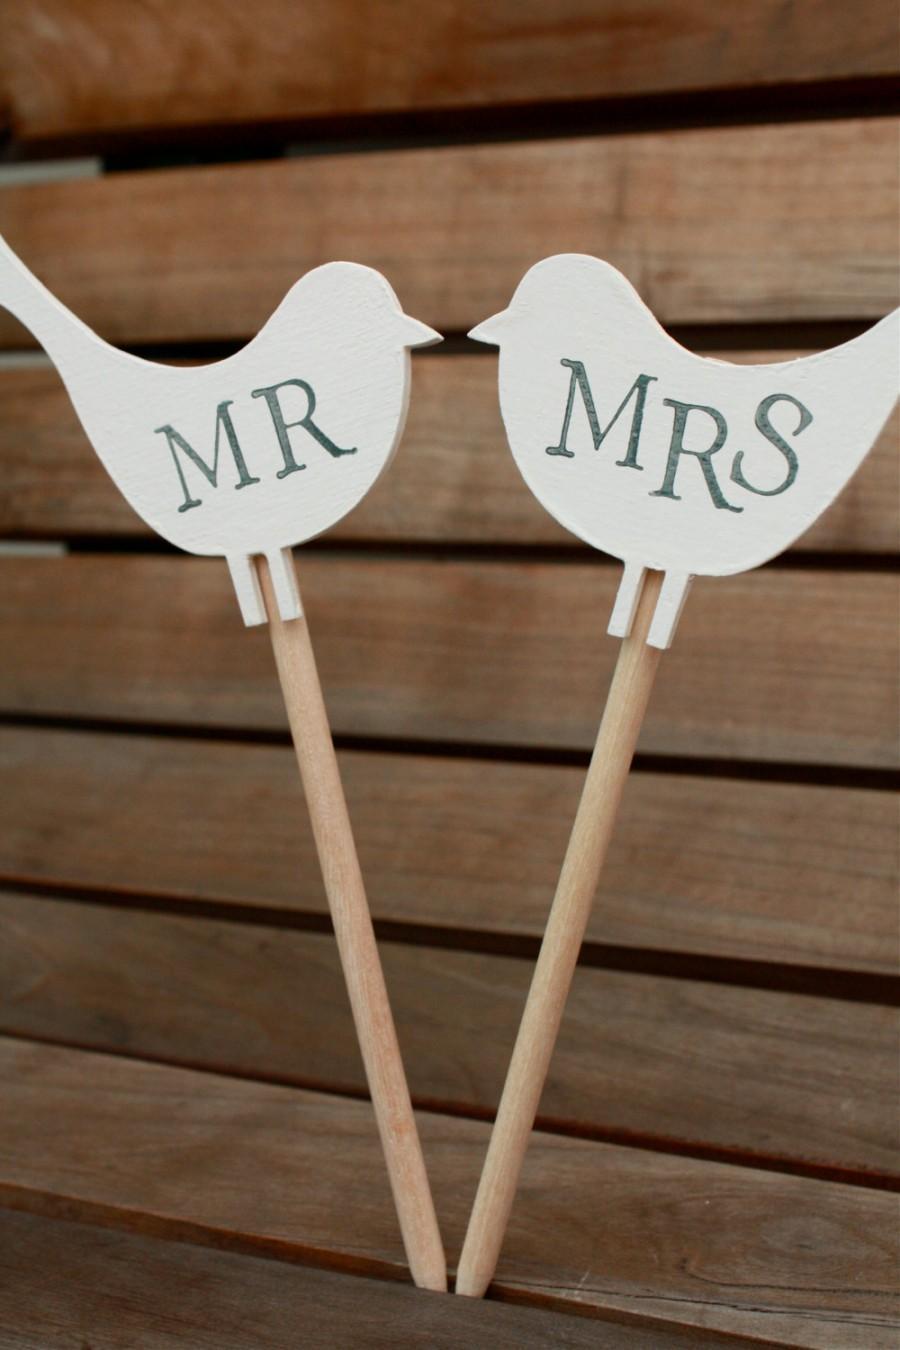 Mariage - M R & M R S  L O V E  B I R D S for Wedding Cake Topper